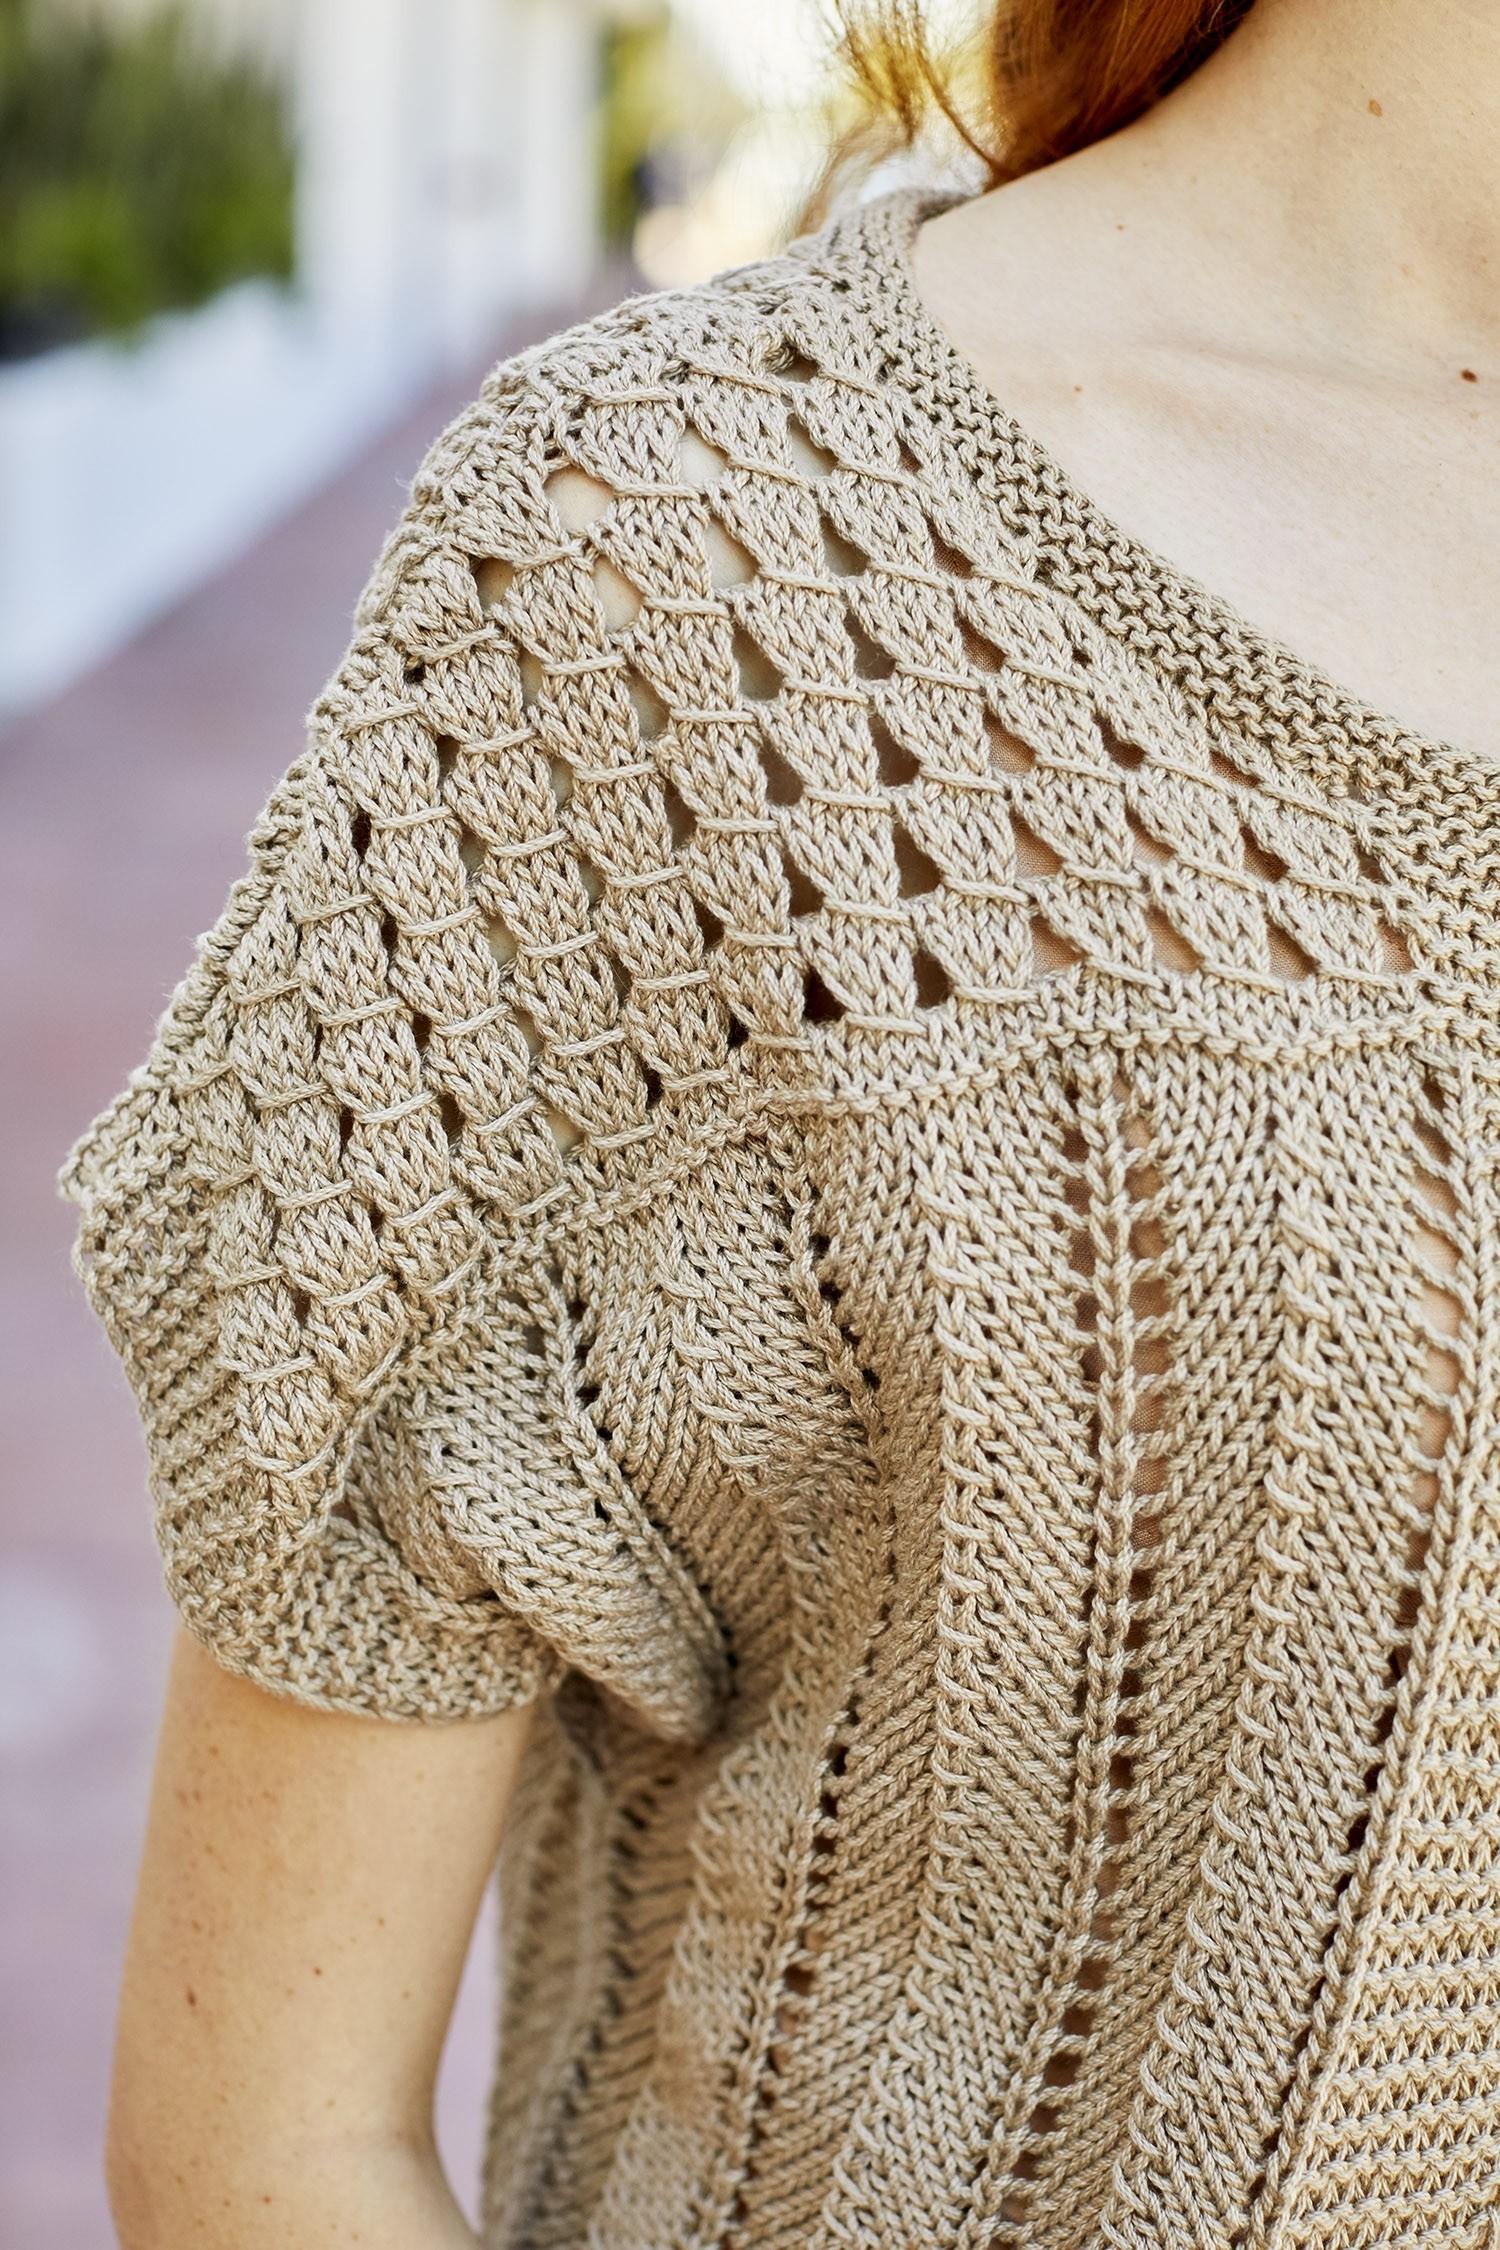 Free Knitting Pattern for a Malibu Bolero v4 ⋆ Knitting Bee